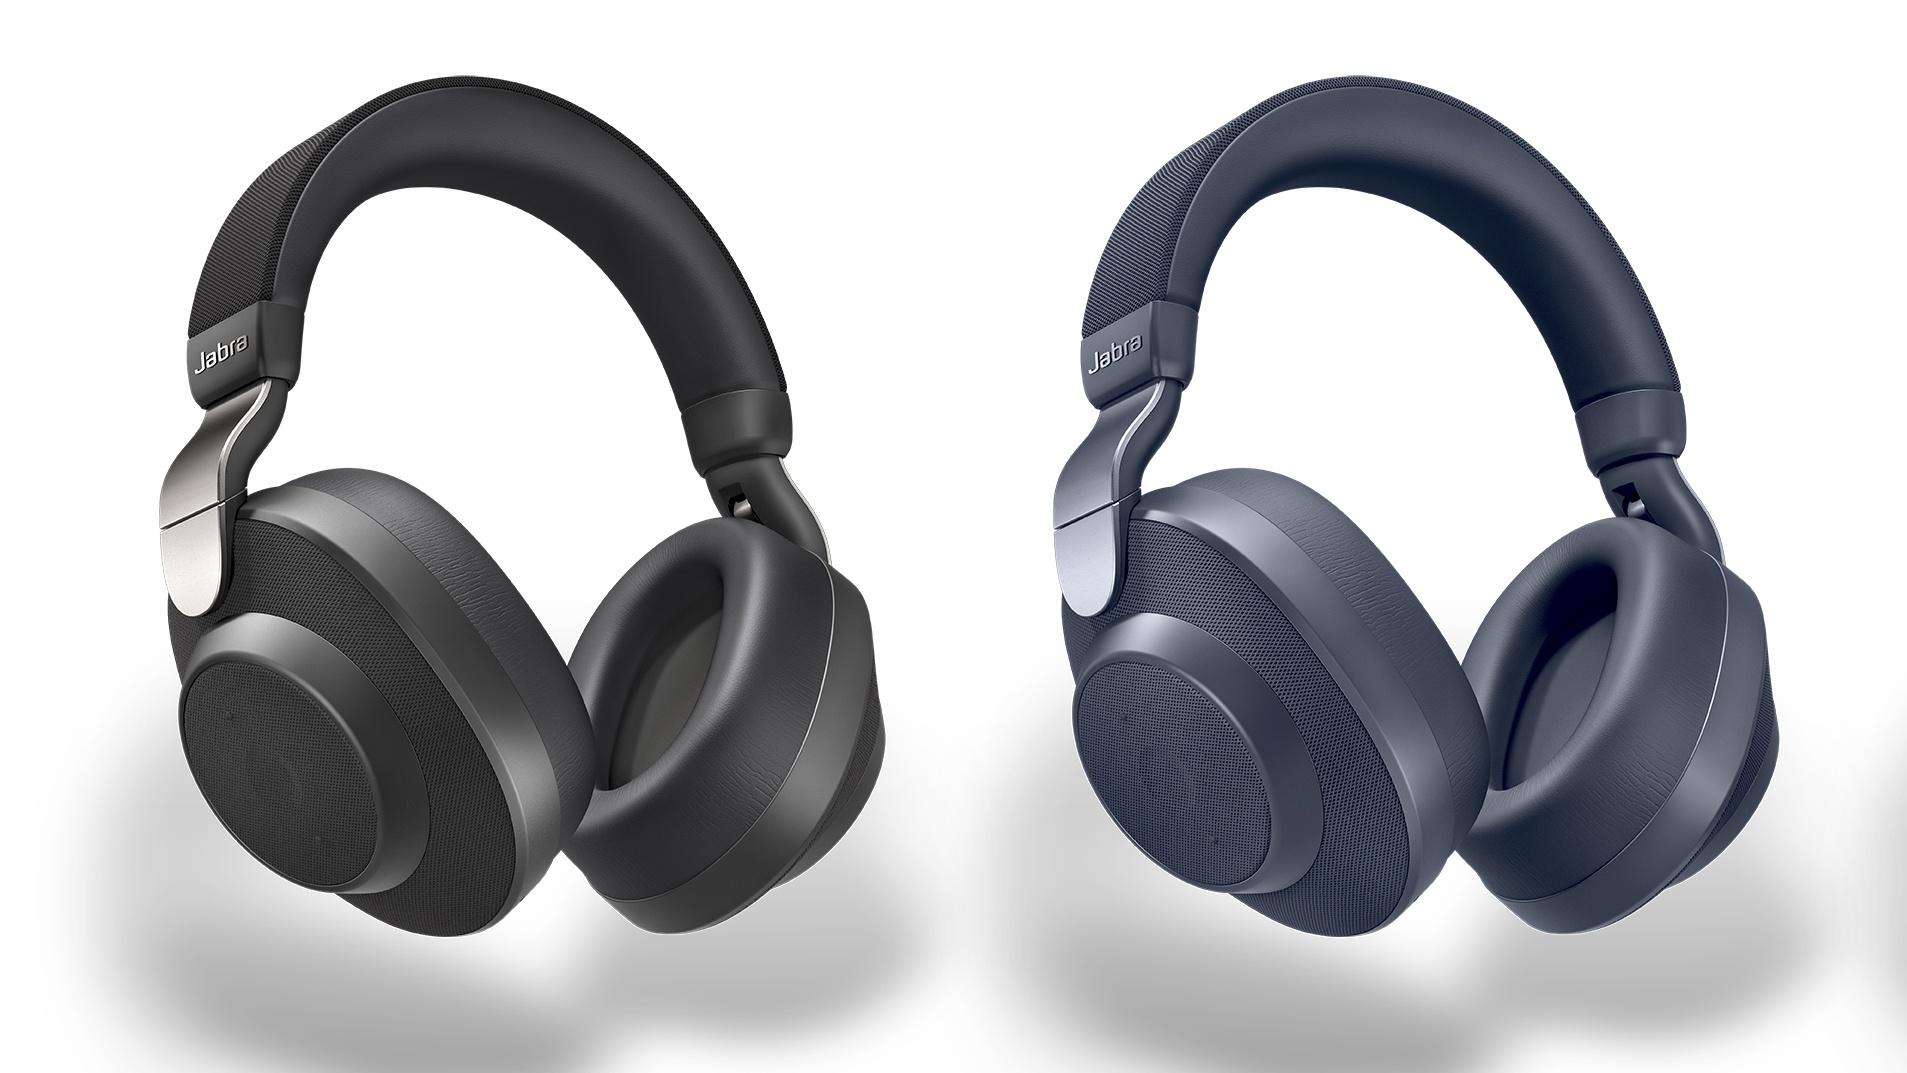 Jabra Elite 85h headphones change sound and invoke Alexa without a